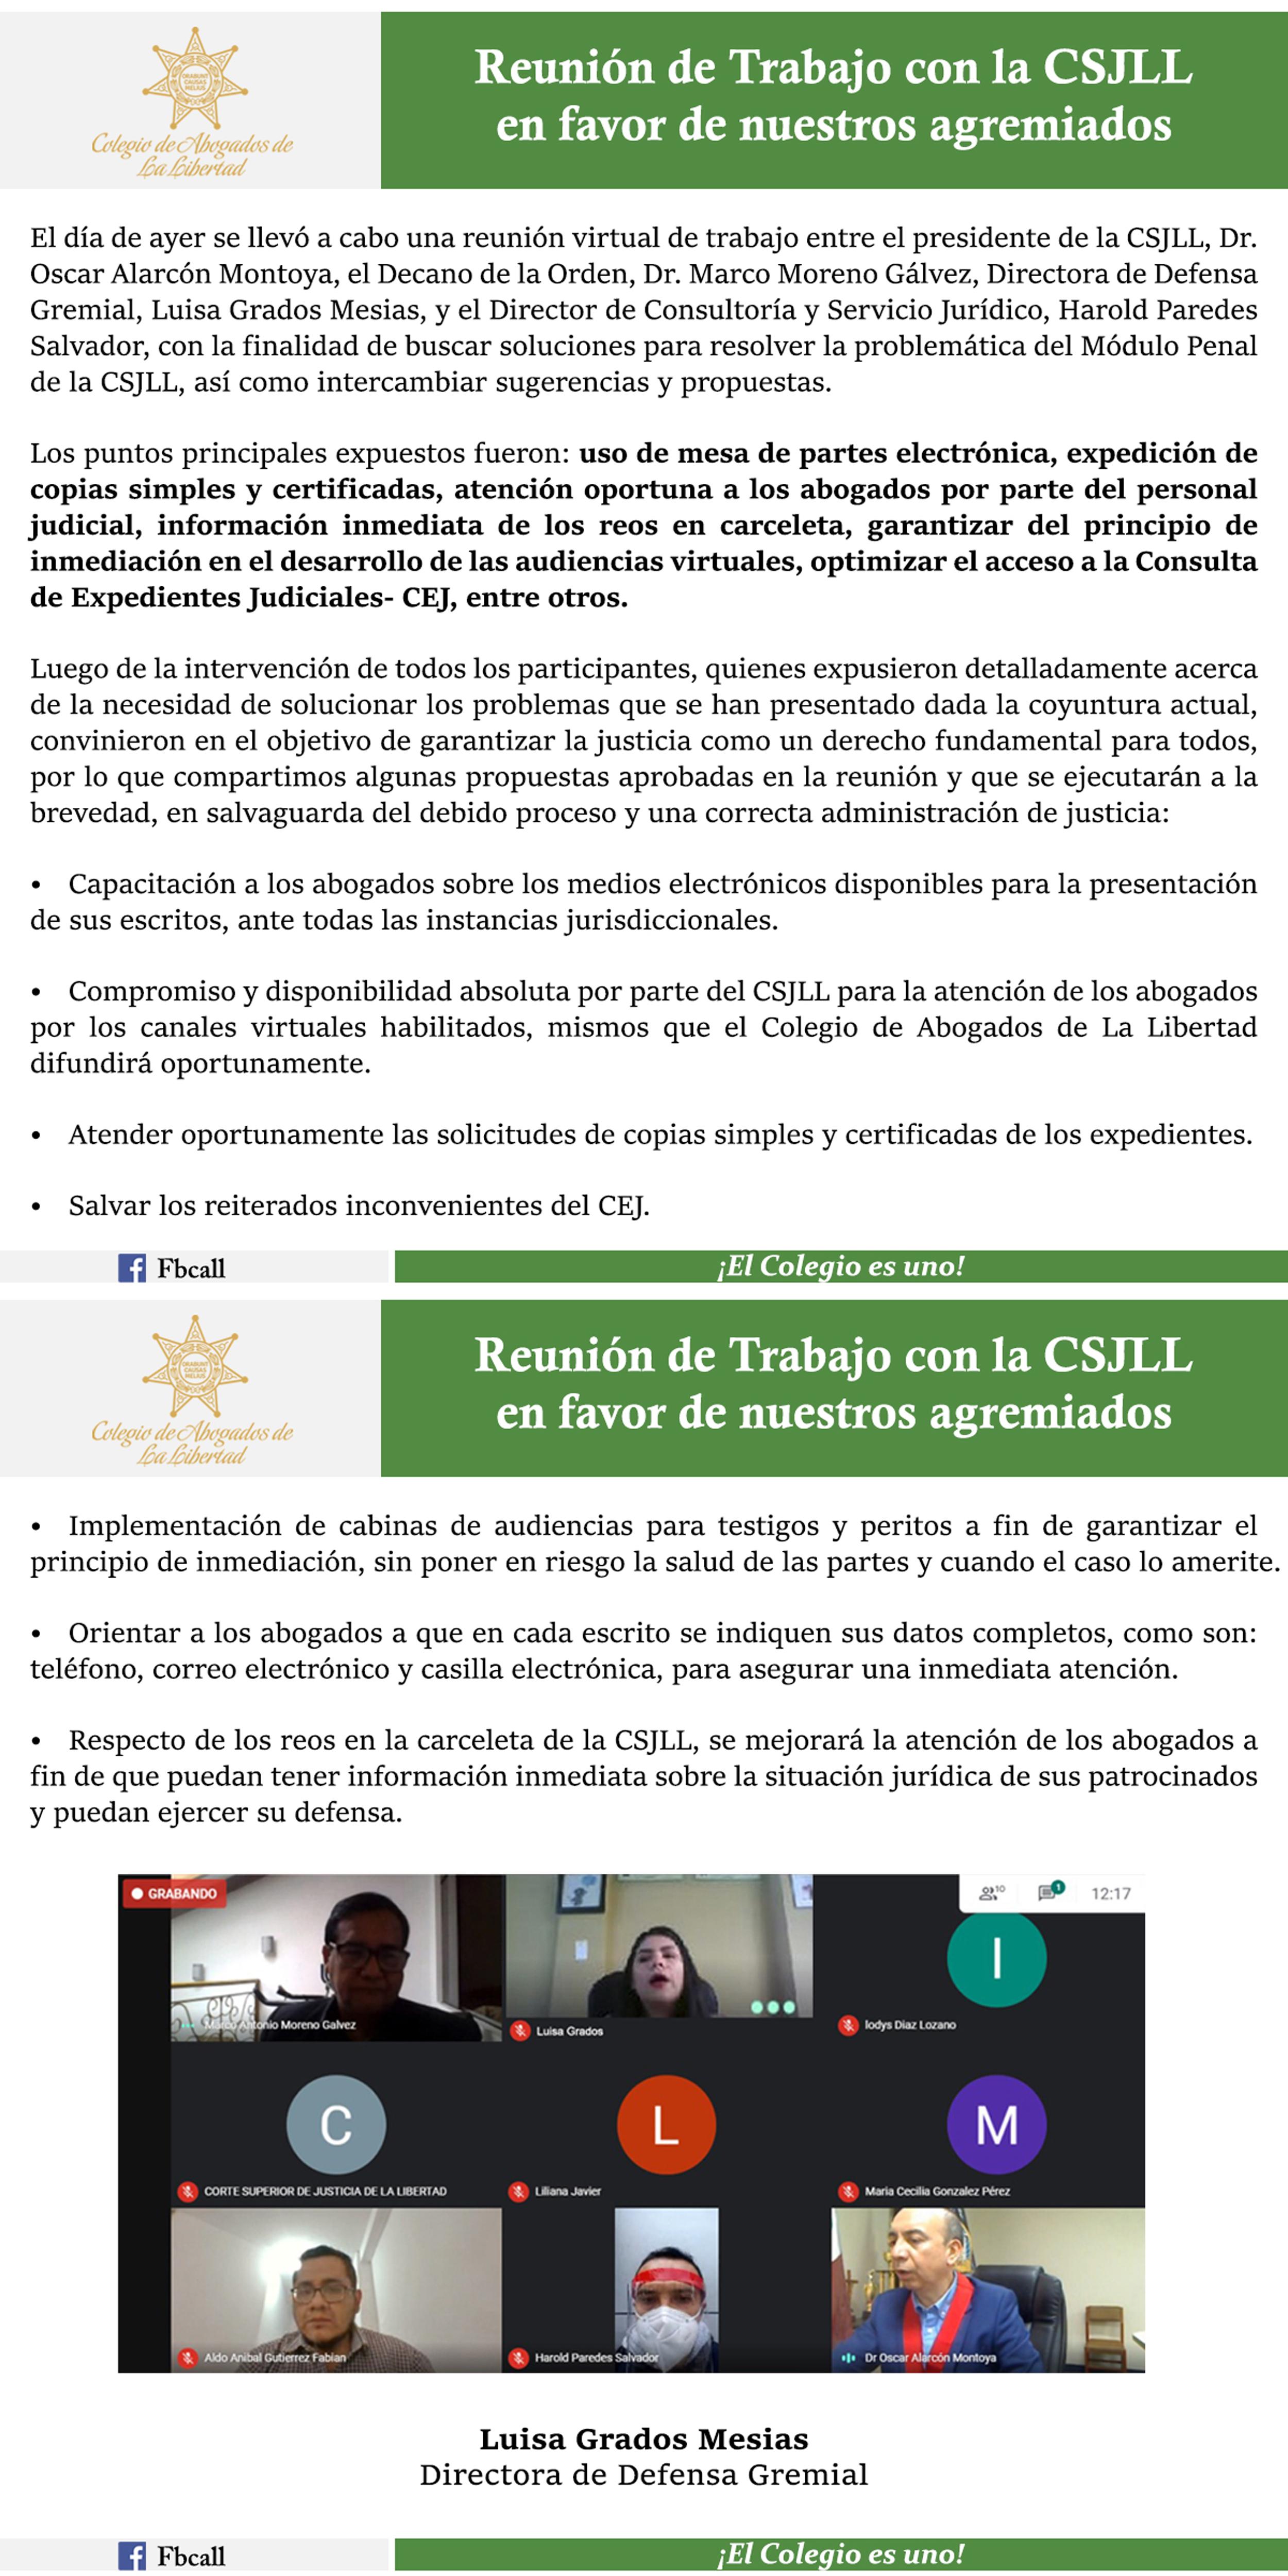 https://www.call.org.pe//noticias/img/20200905_0333_32_0.jpg